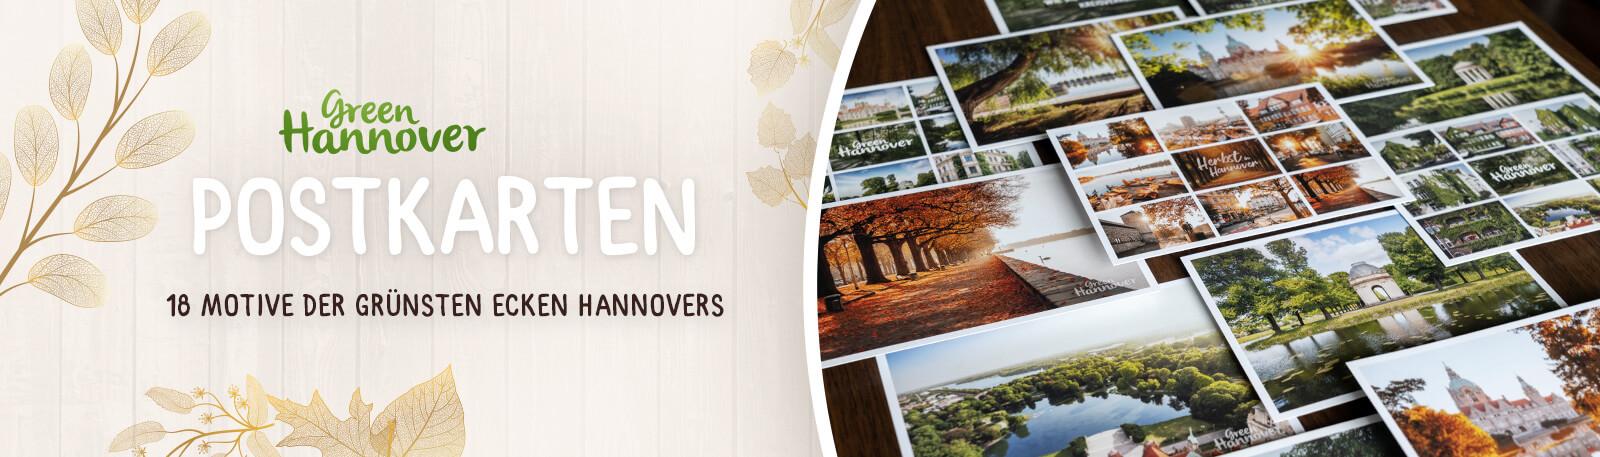 GreenHannover2020_Teaser_Postkarten